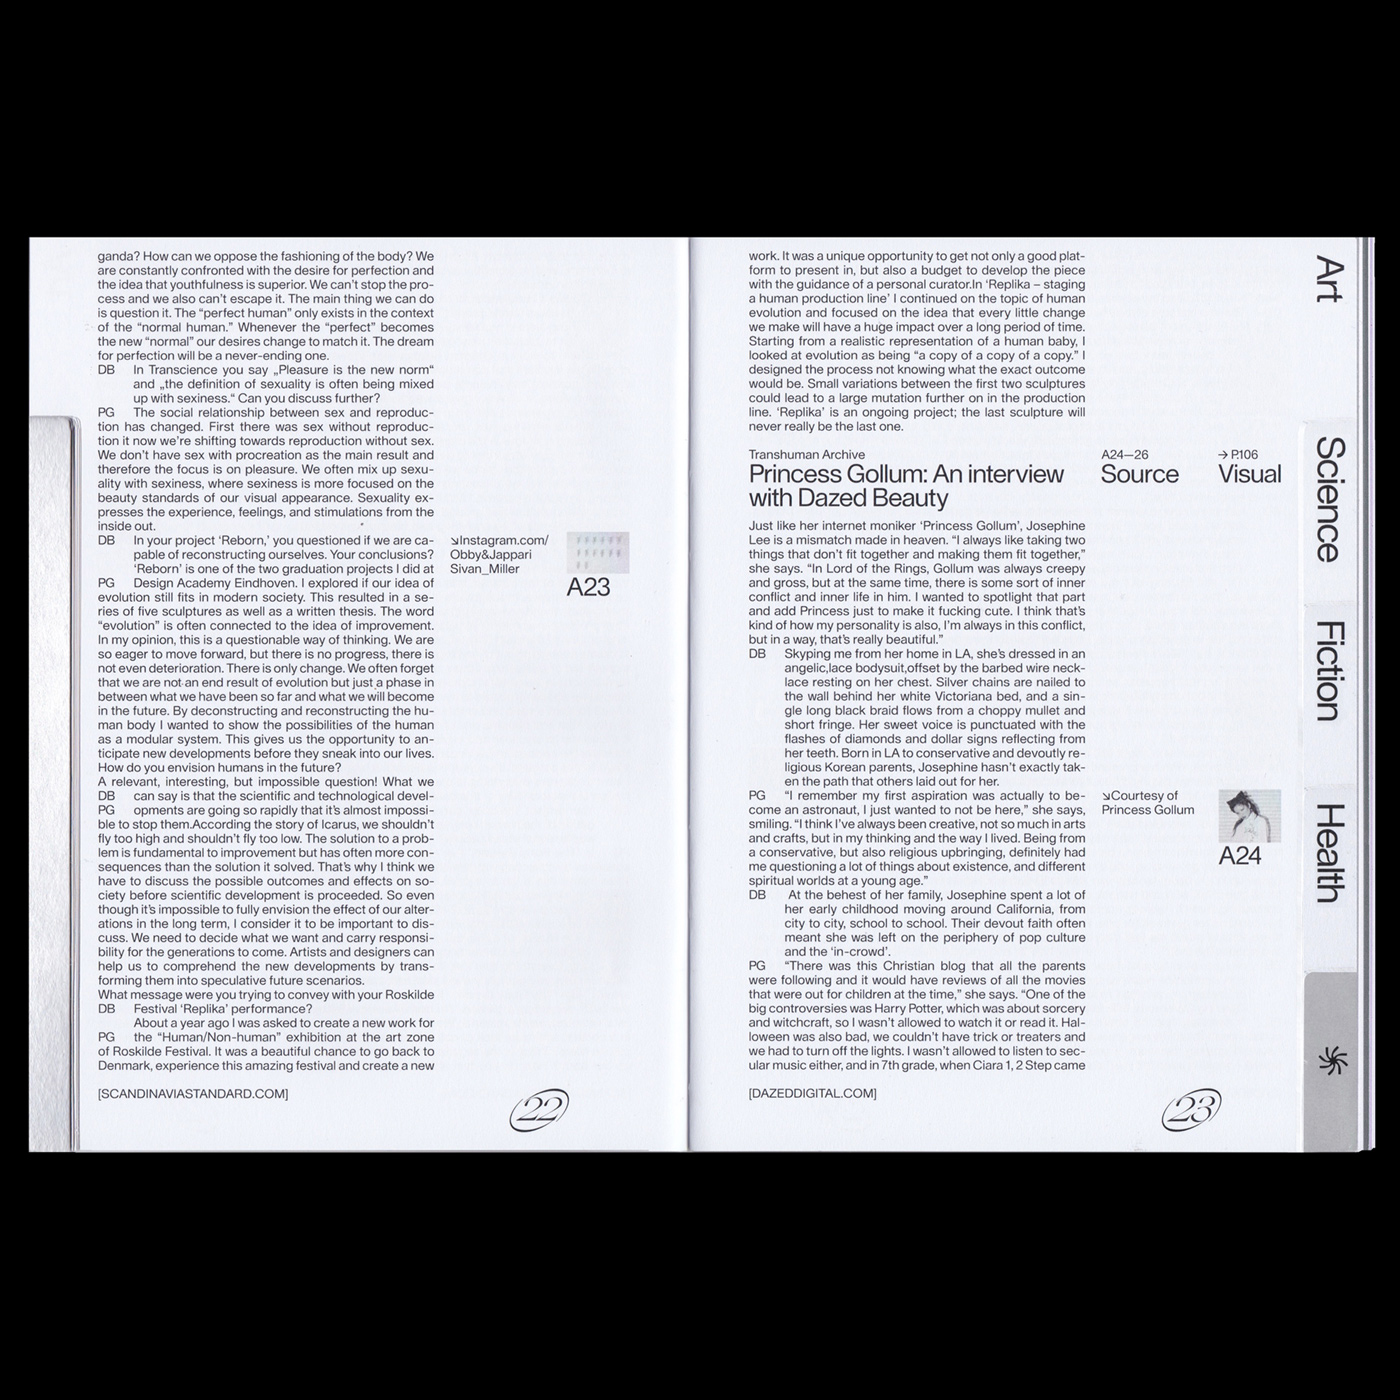 11 collide24 Transhuman Archive Stella Klump Leonie Krein Moritz Büsselberg - The book 'Transhuman Archive' by Stella Klump, Leonie Krein and Moritz Büsselberg explores the effects of transhumanism in our times